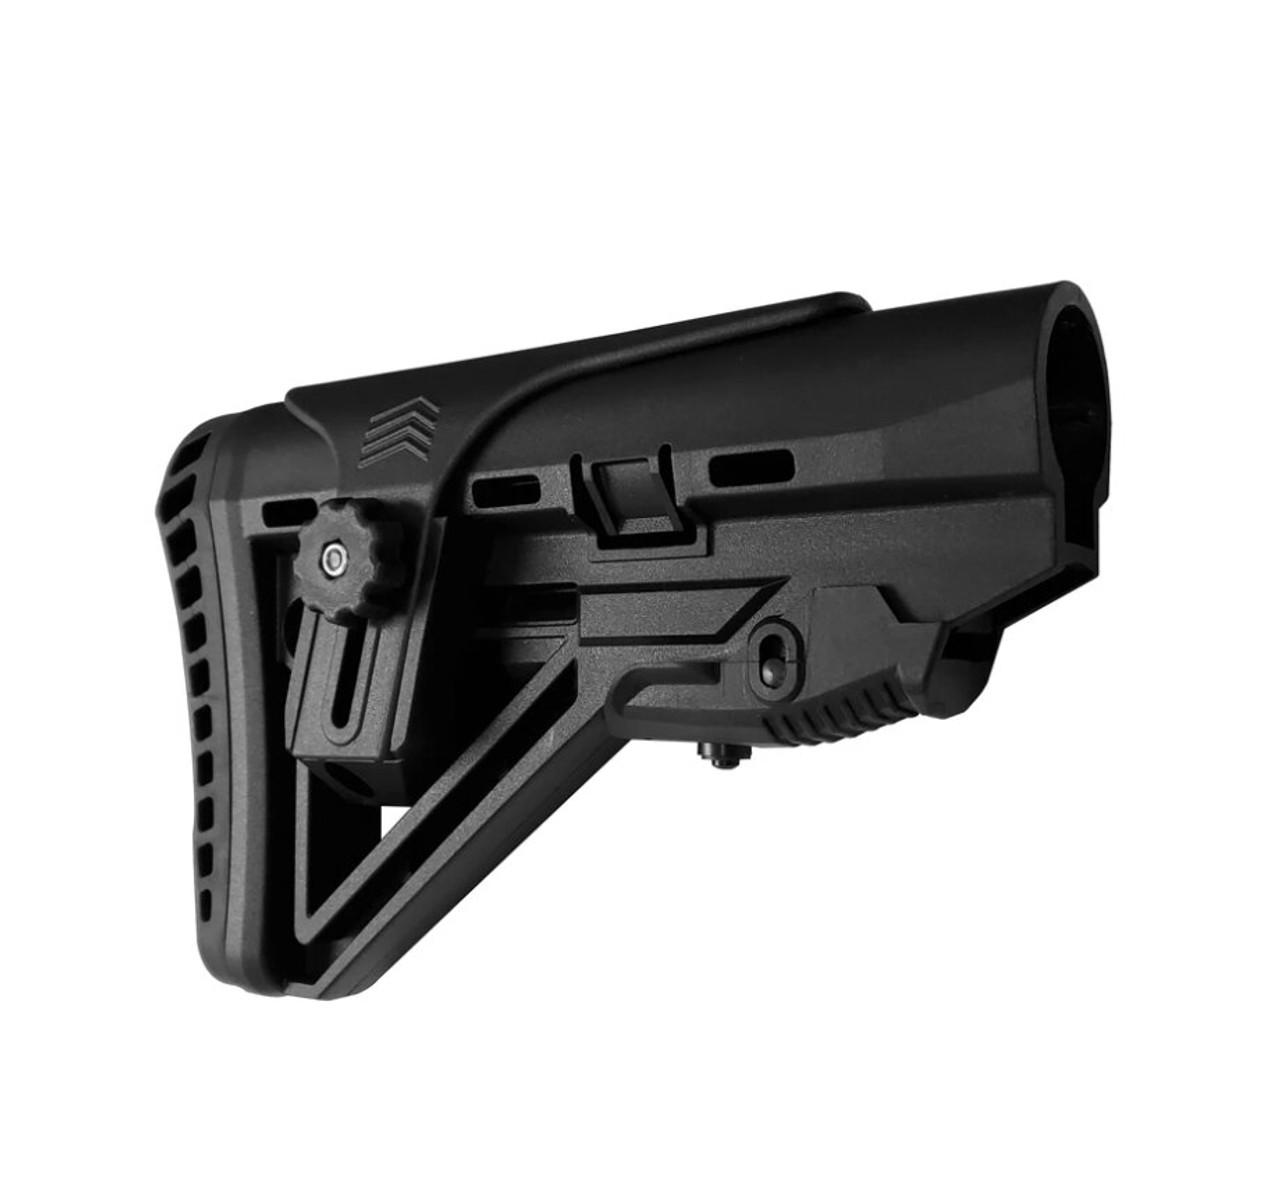 Defender V2 AR Shock Absorbing Stock Kit